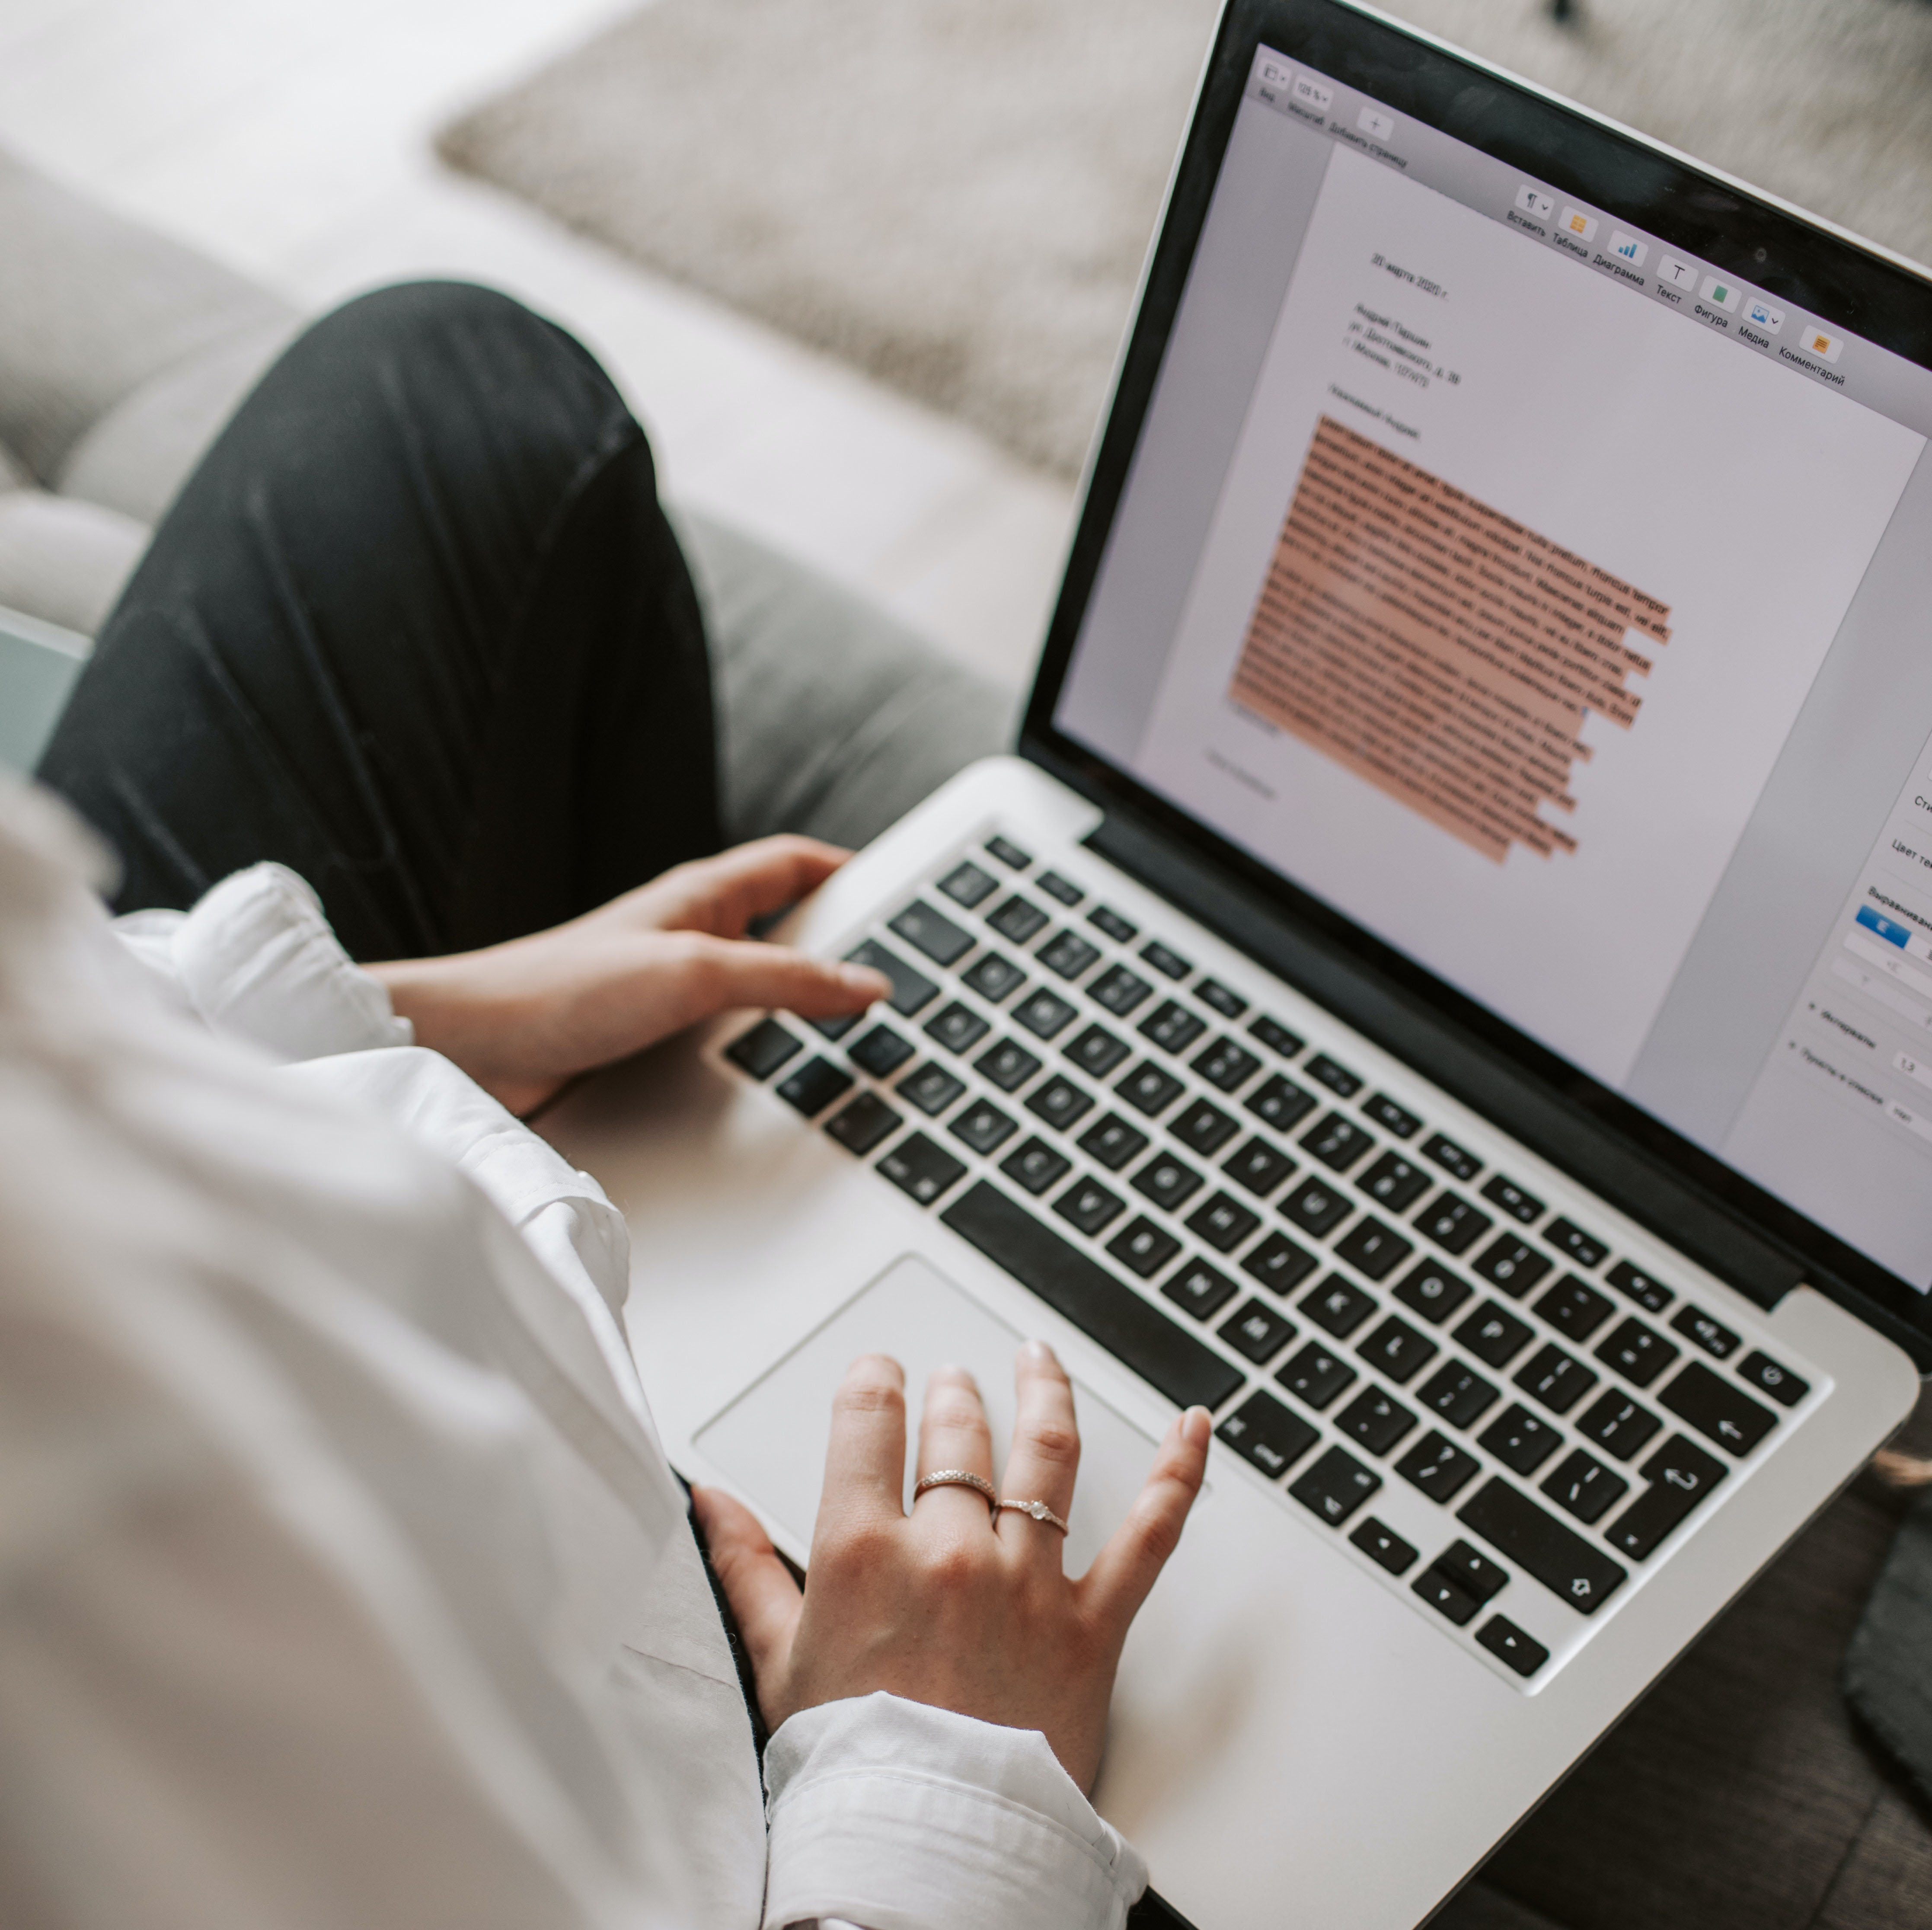 PD Técnicas cualitativas de análisis de contenido